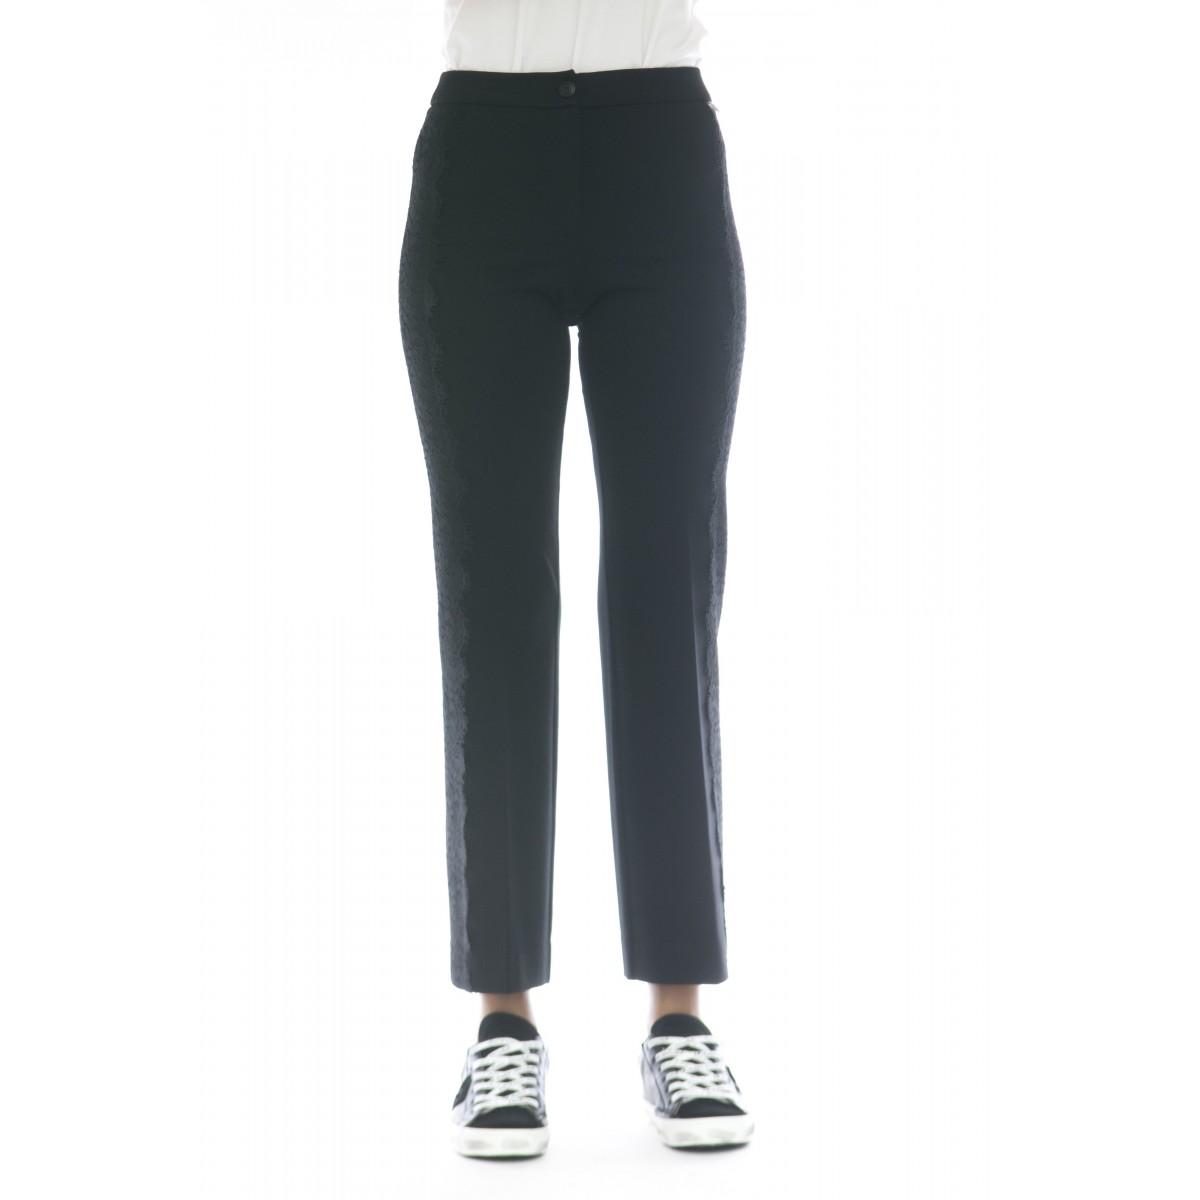 Pantalone donna - Tt2210 pantalone banda pizzo